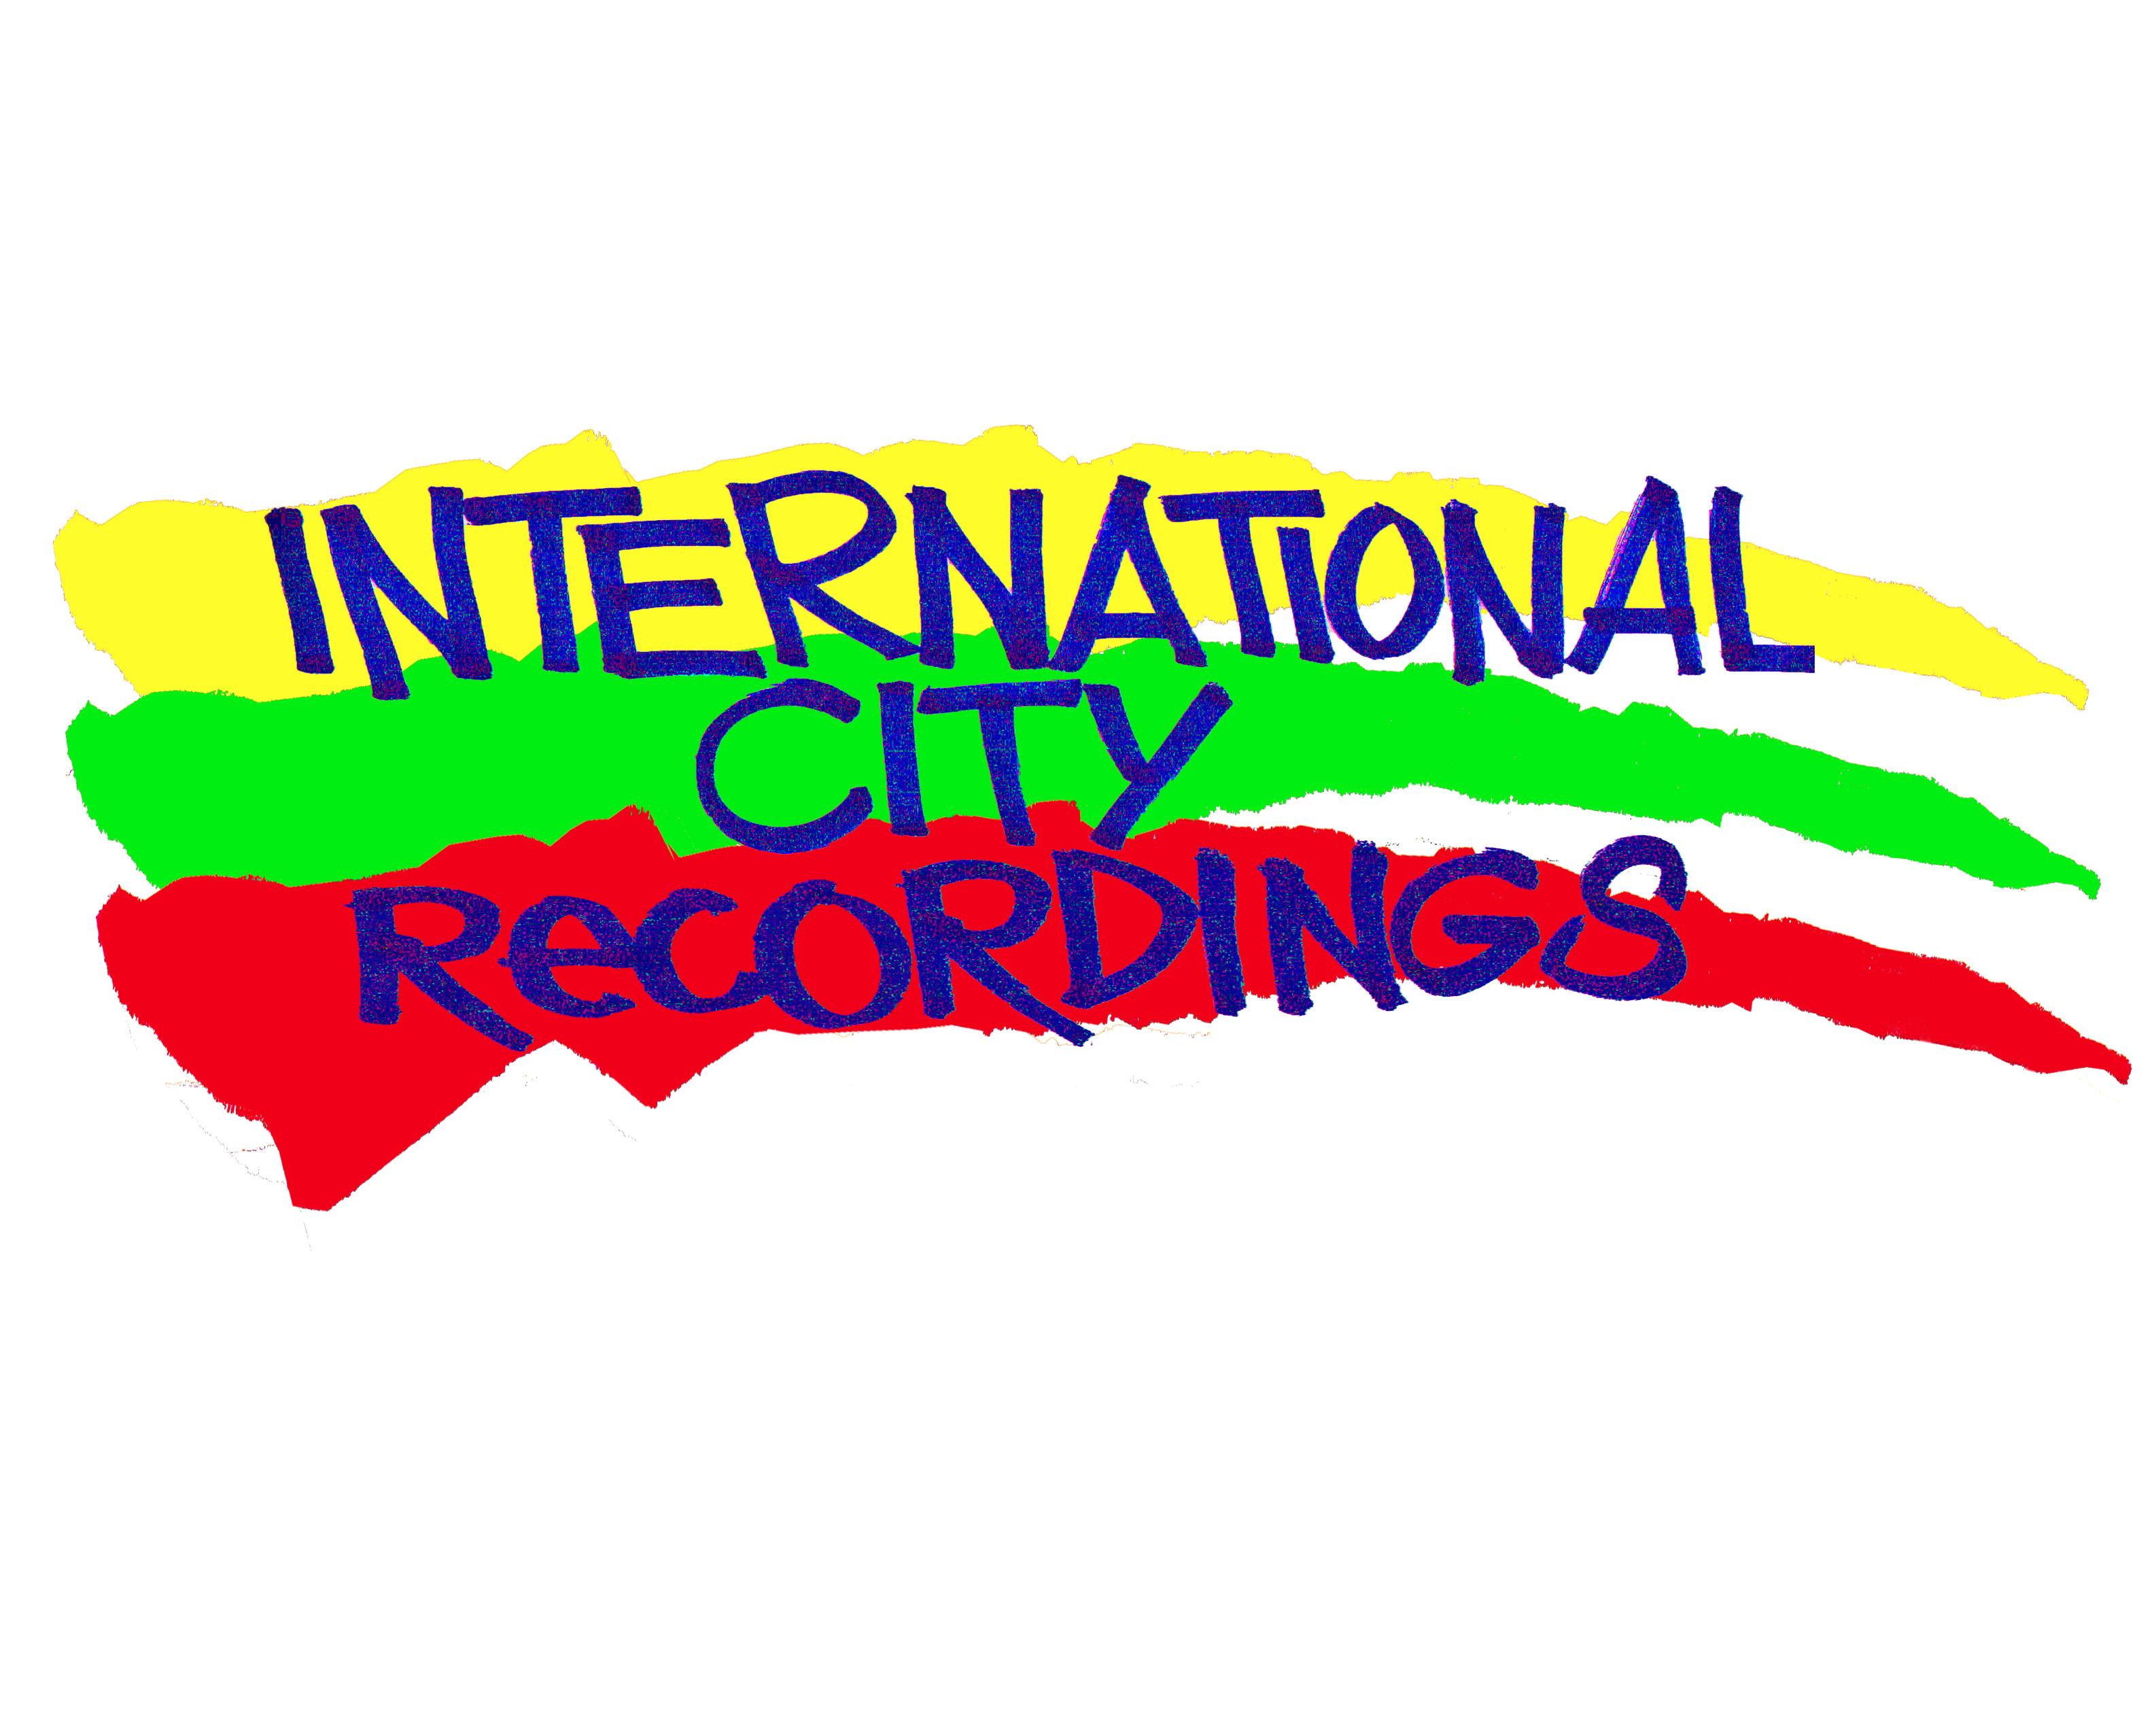 International City Recordings